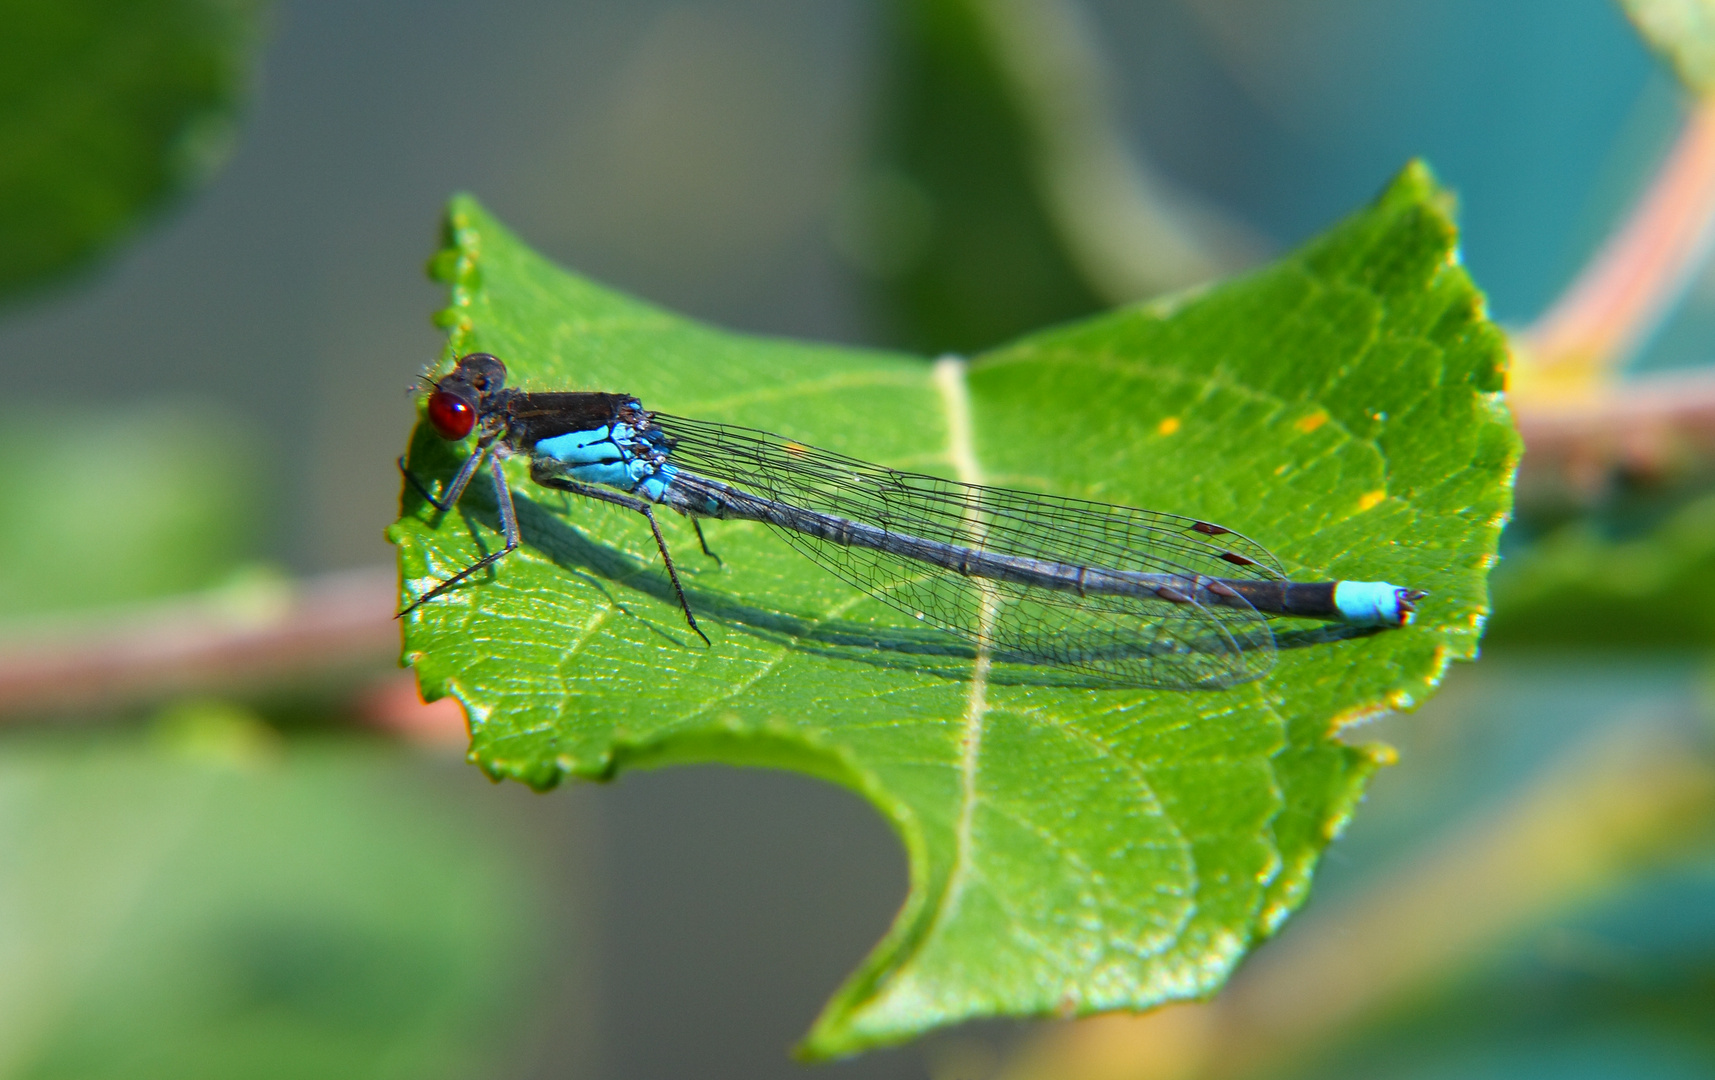 Auch blaue Libellen brauchen mal ne lila ähh... grüne Pause